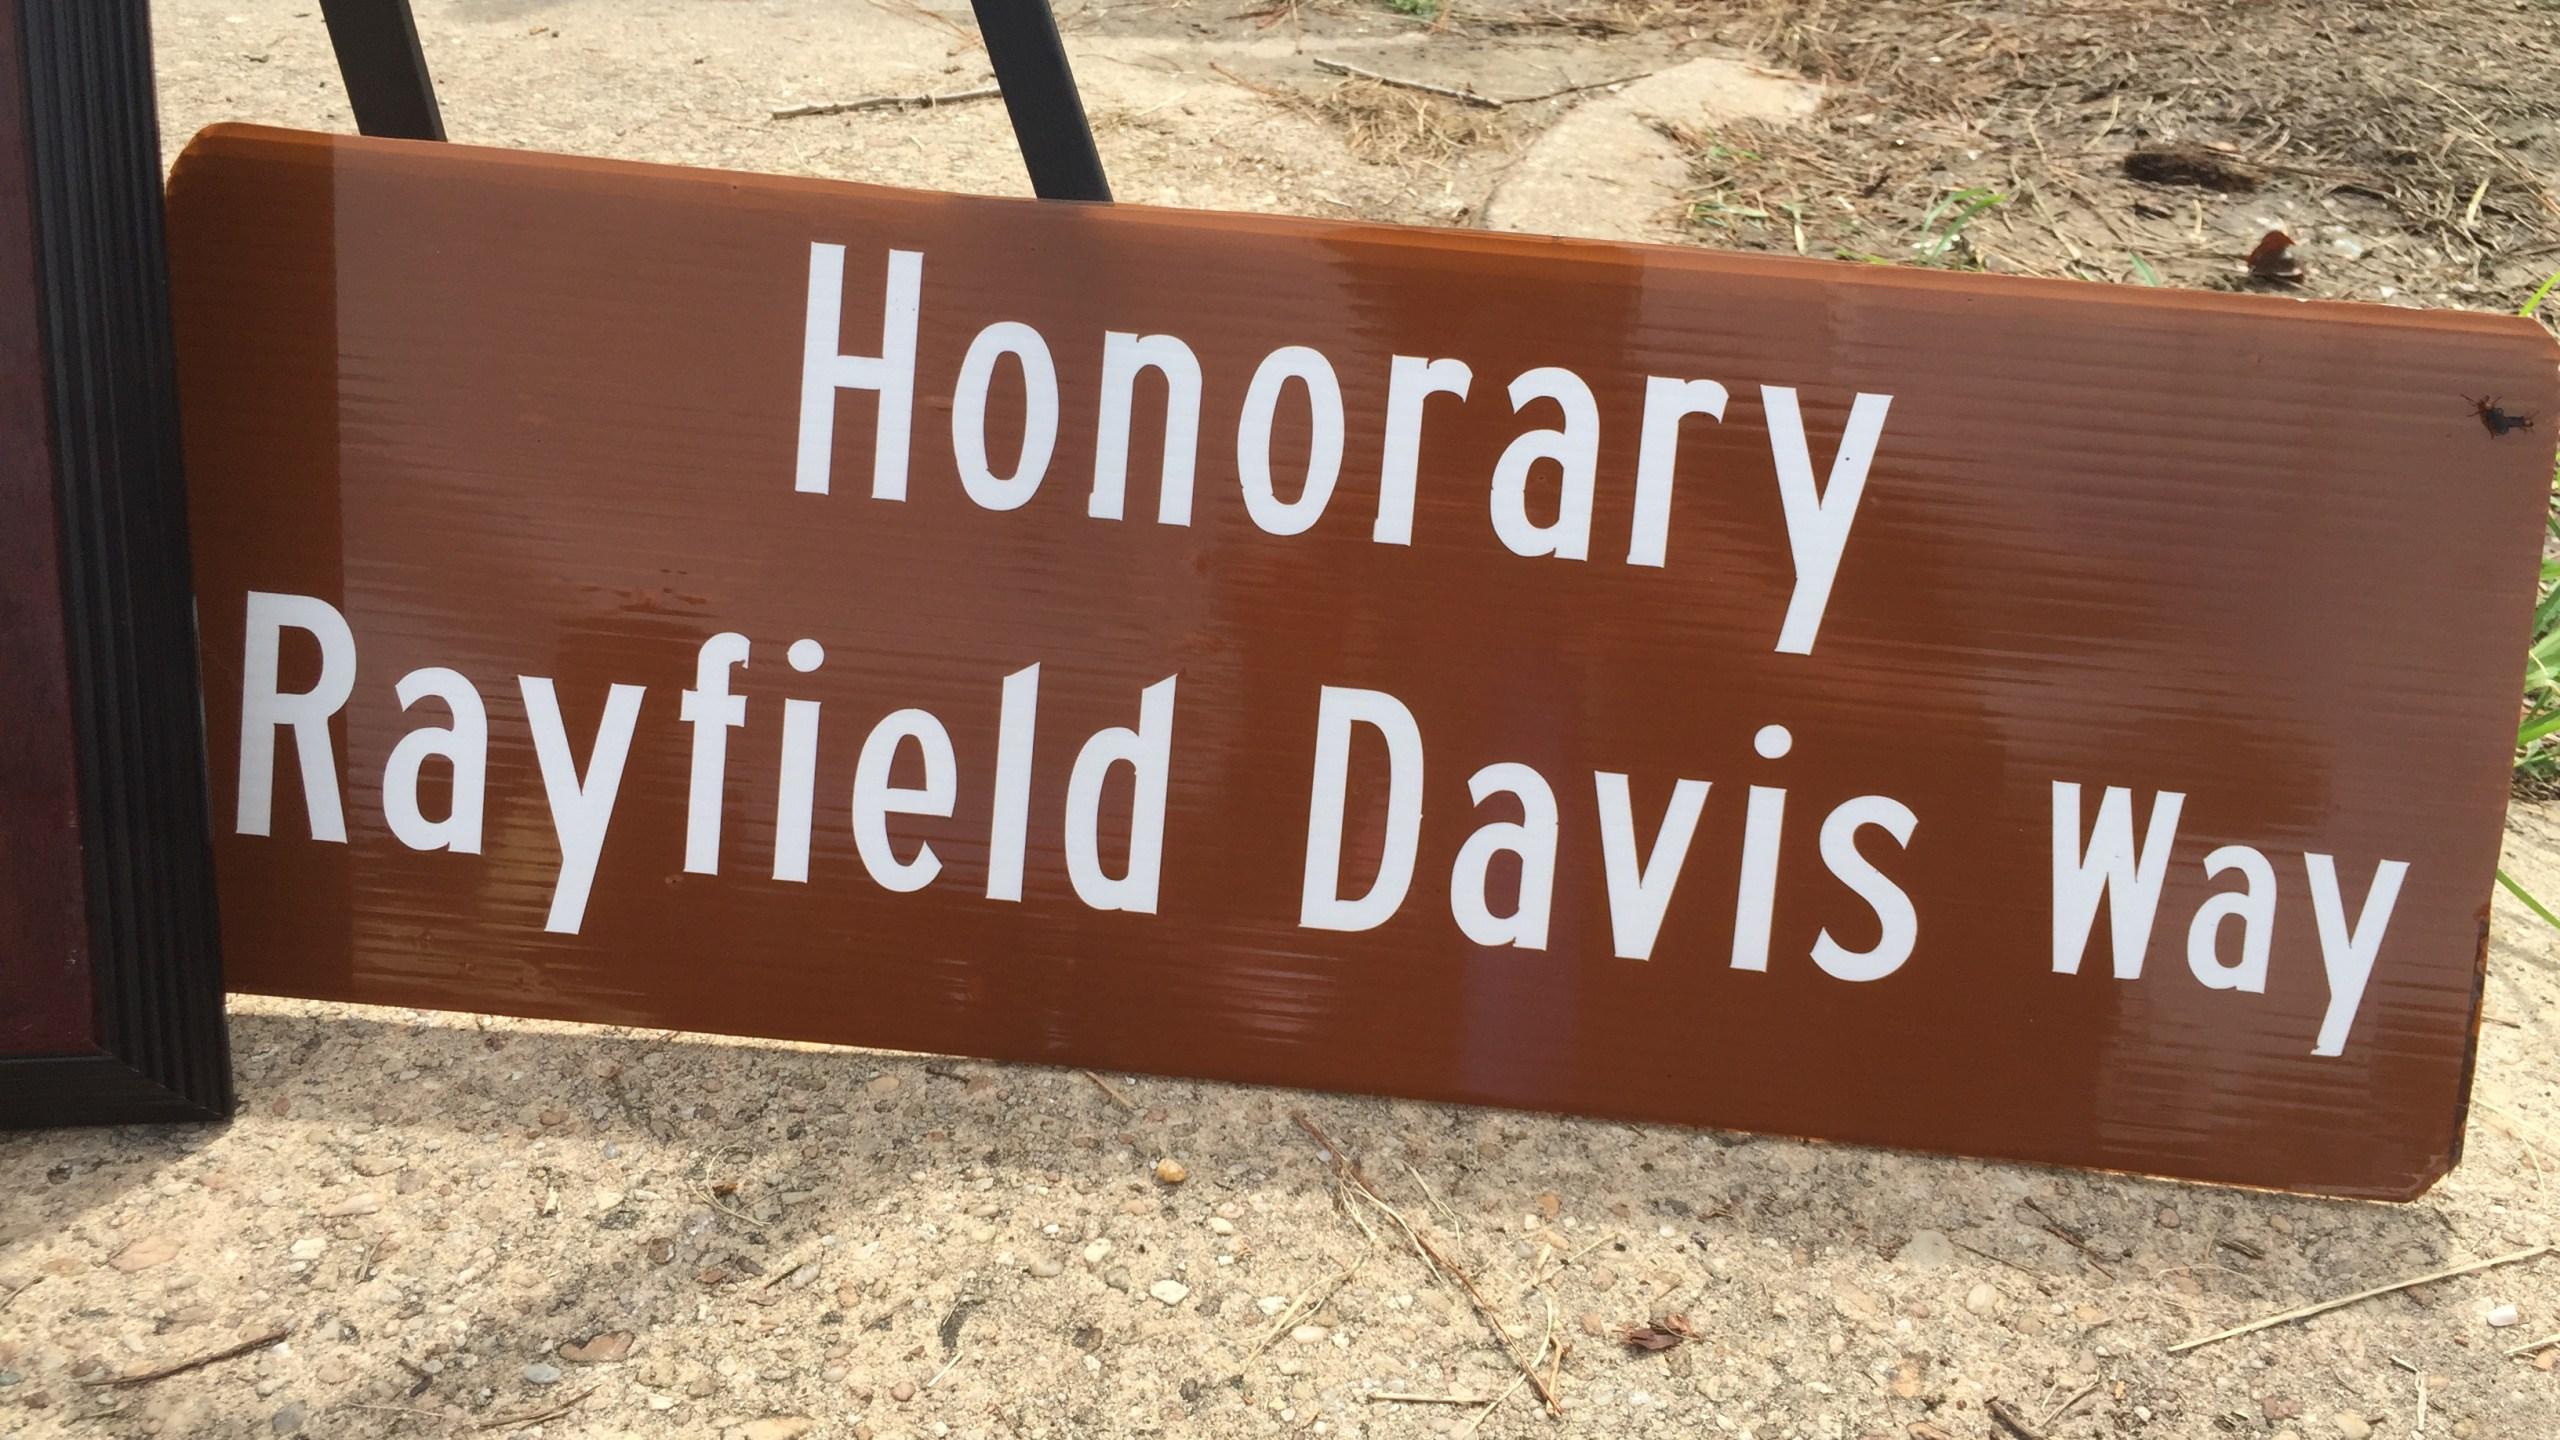 Rayfield Davis Way.JPG